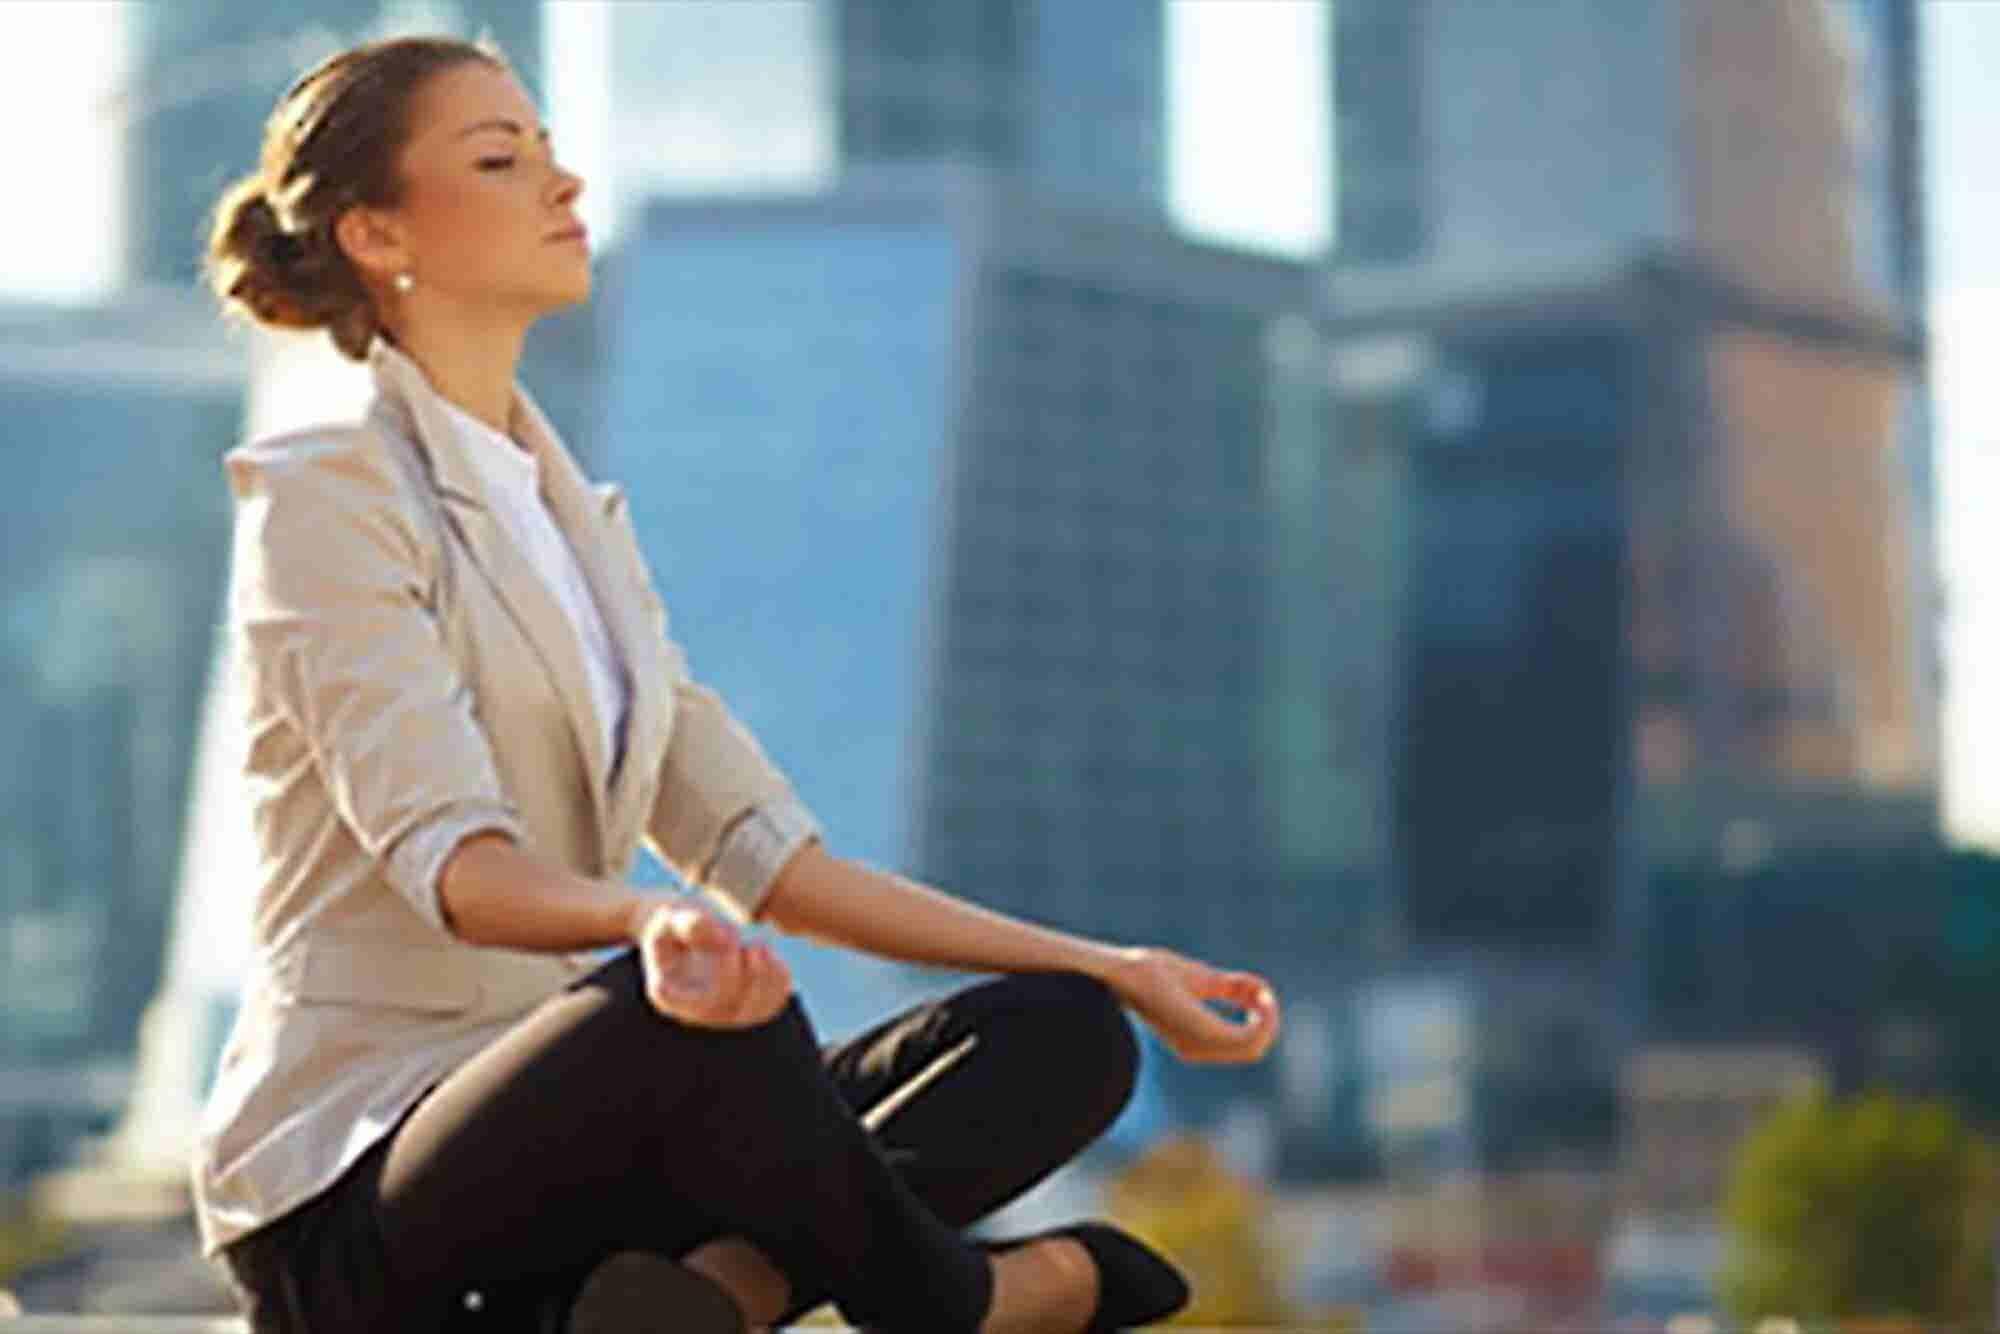 7 Steps to Regaining Your Focus